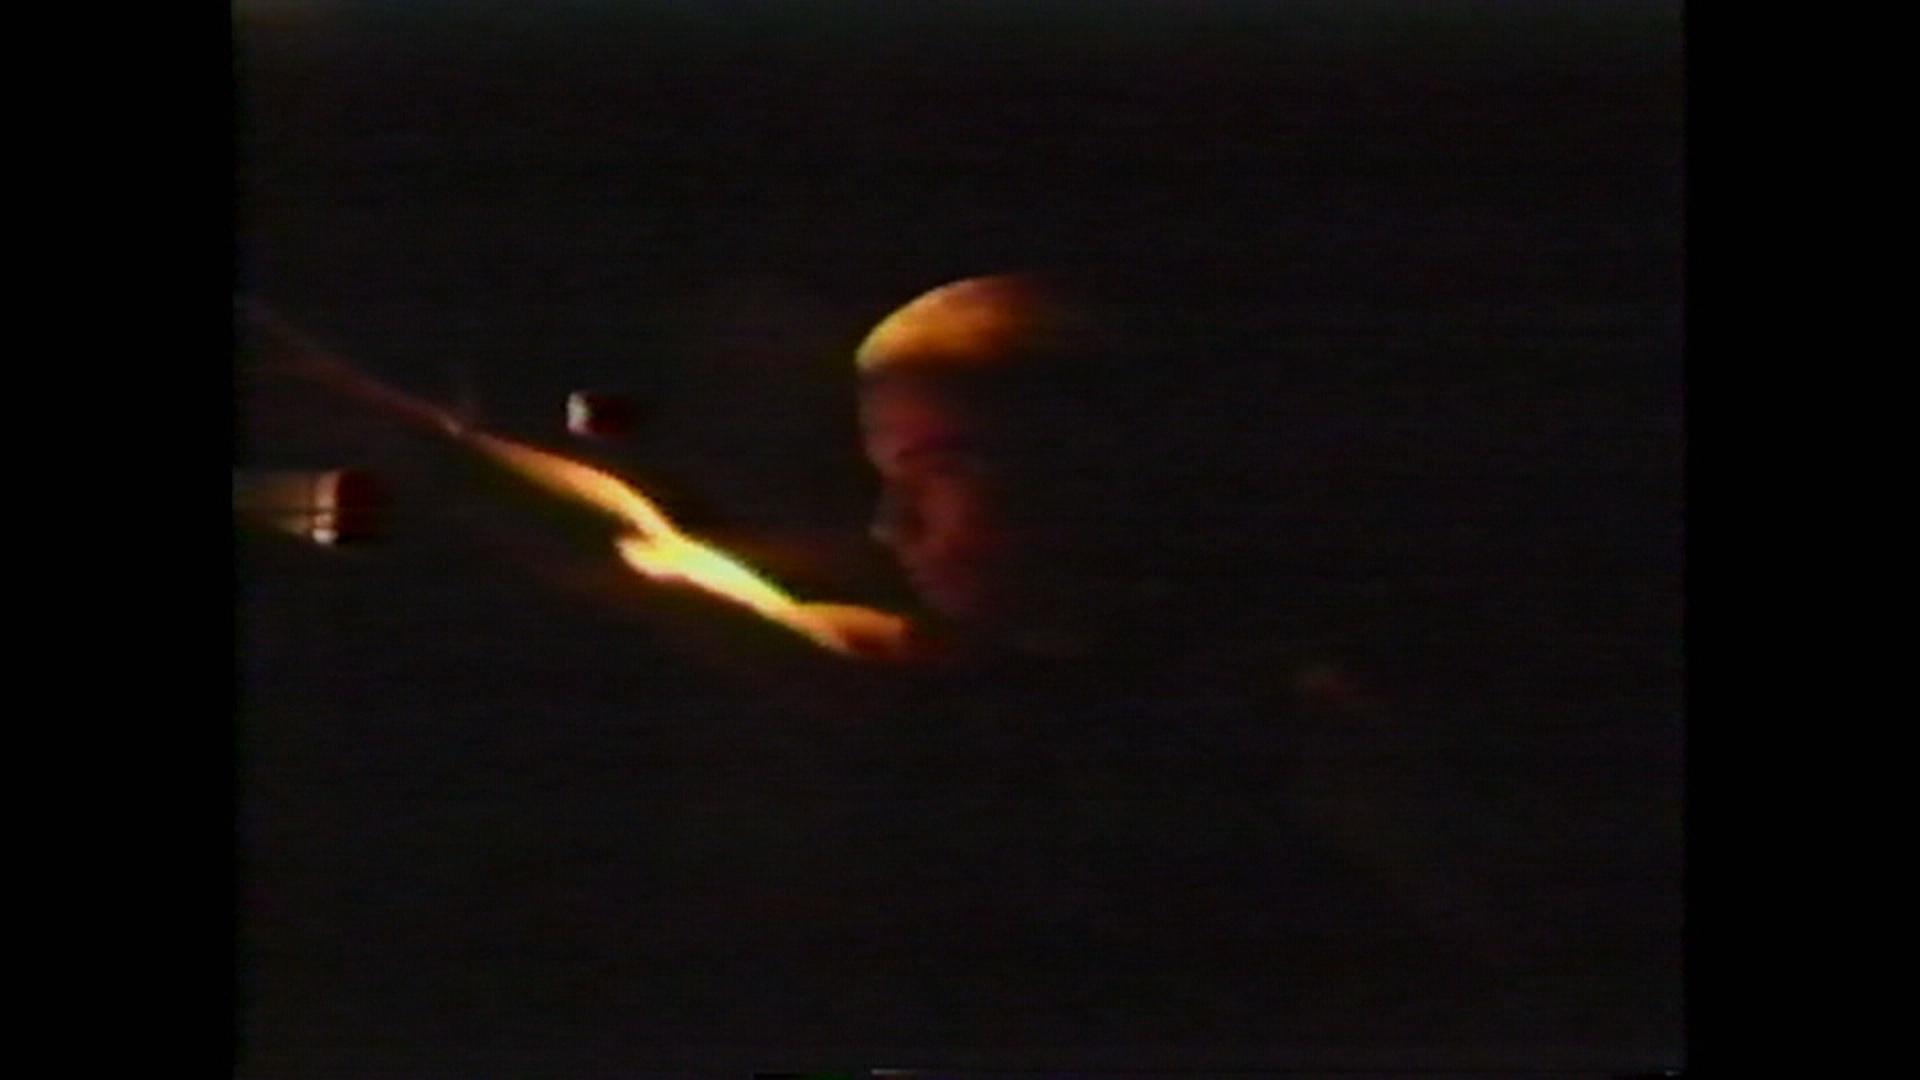 Rohan Quine, 'The Imagination Thief' - film 'KIM 42', still 12